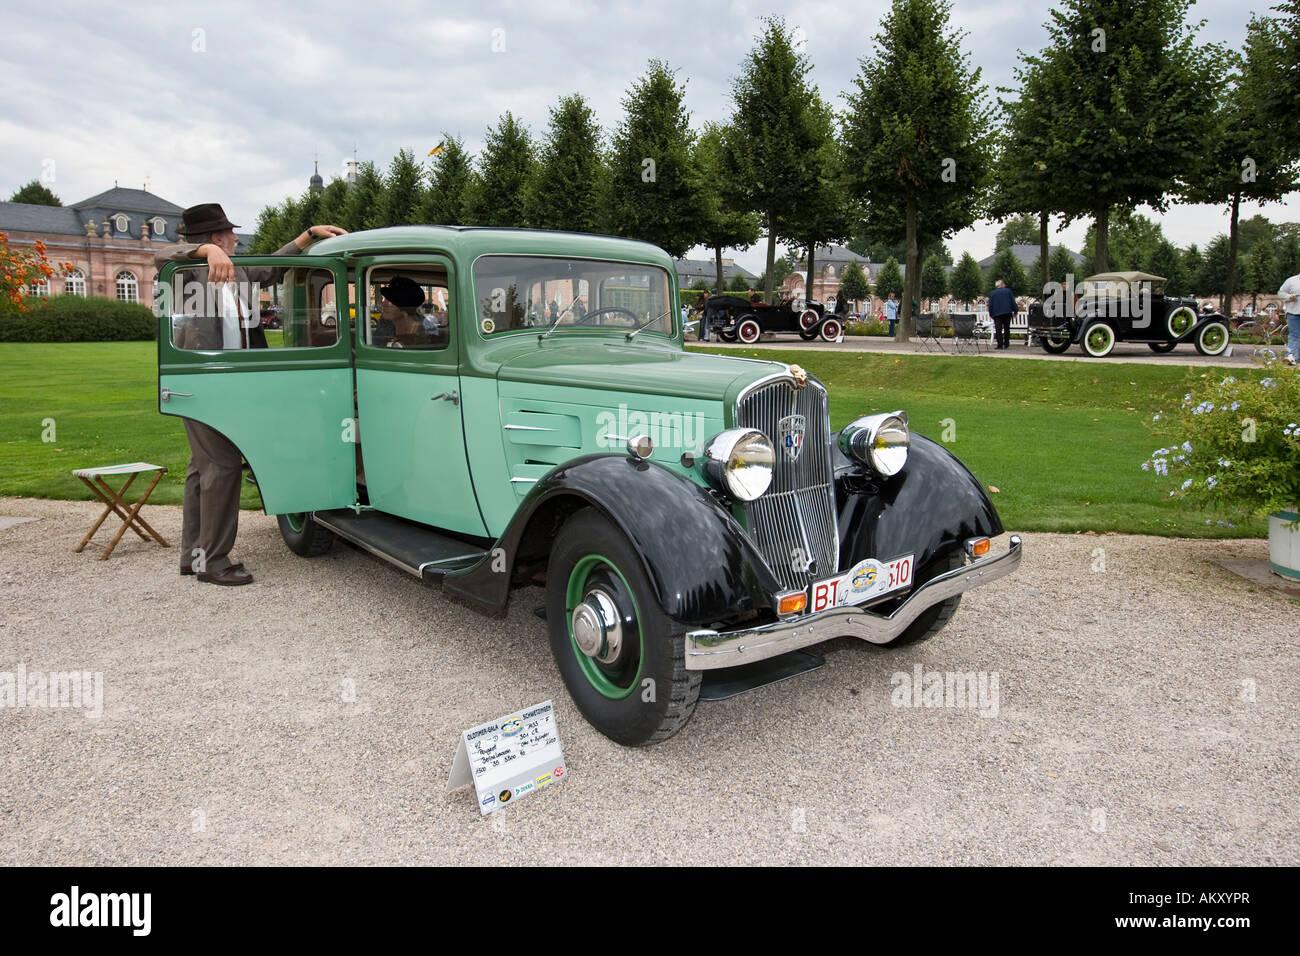 Peugot Berlina Limousin 301 CR France 1933, Vintage Car Gala, Schwetzingen, Baden Wuerttemberg, Germany - Stock Image